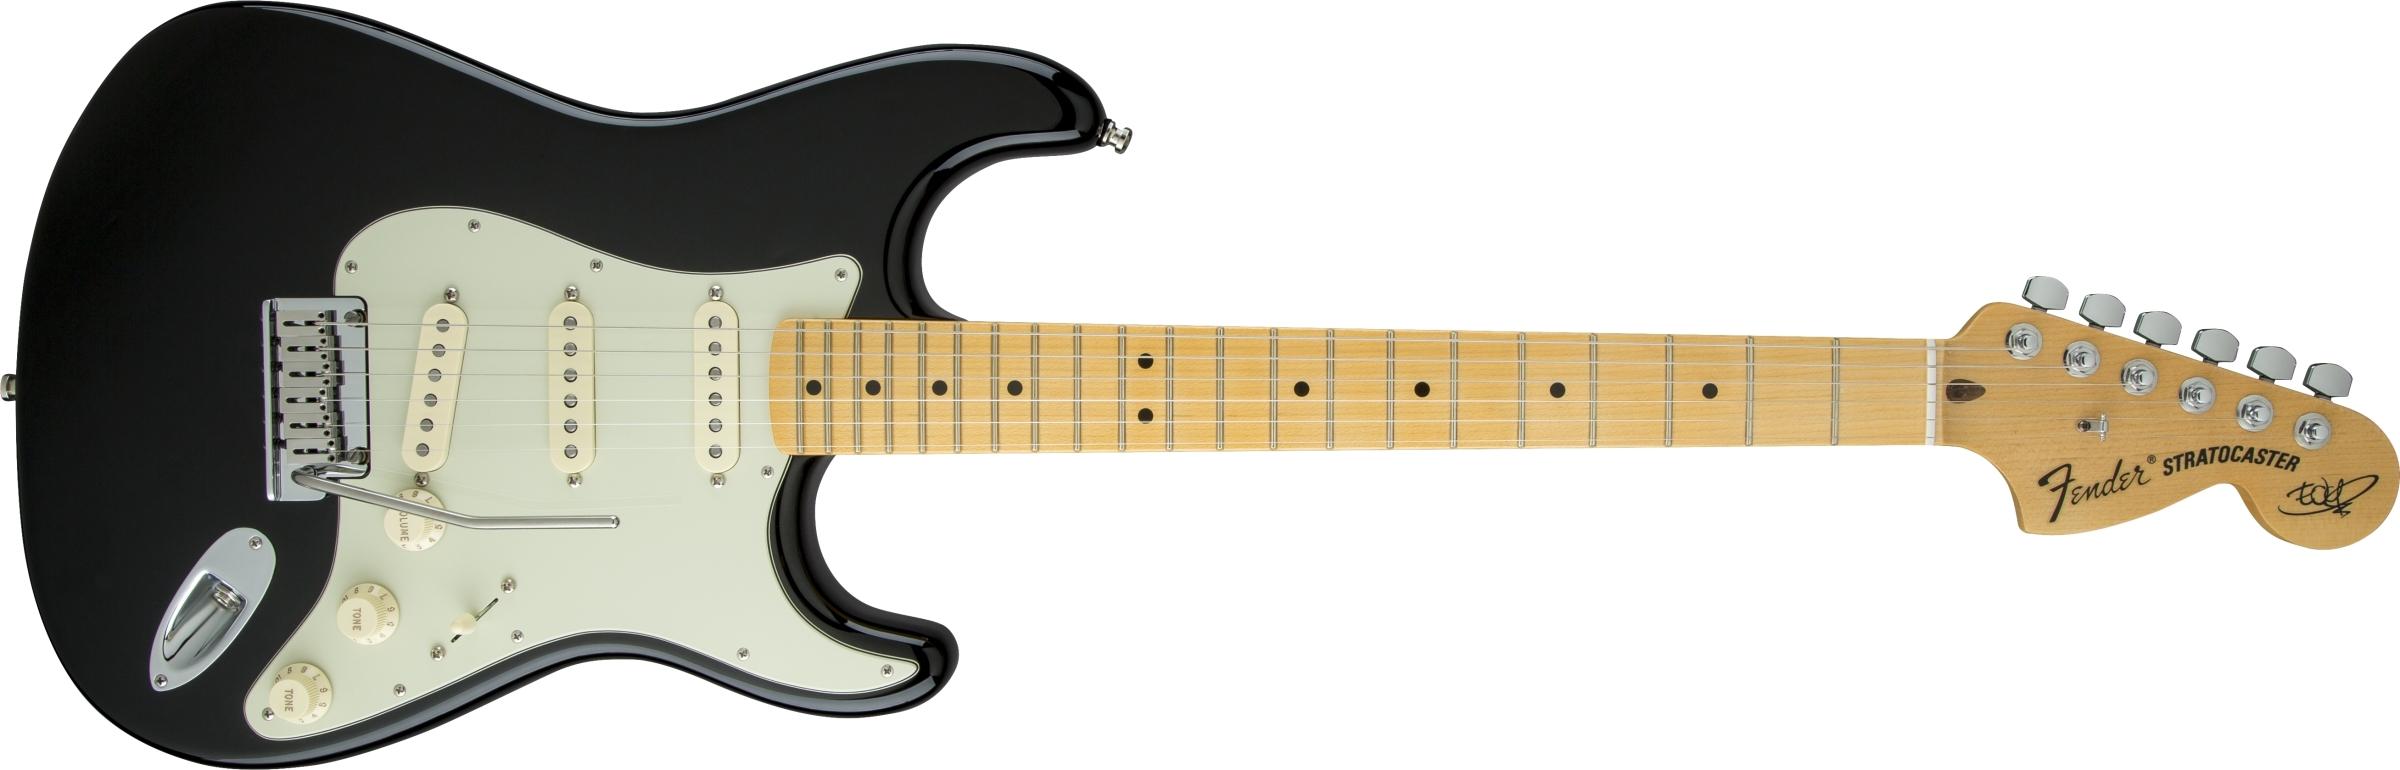 Fender Double Fat Strat Wiring Diagram